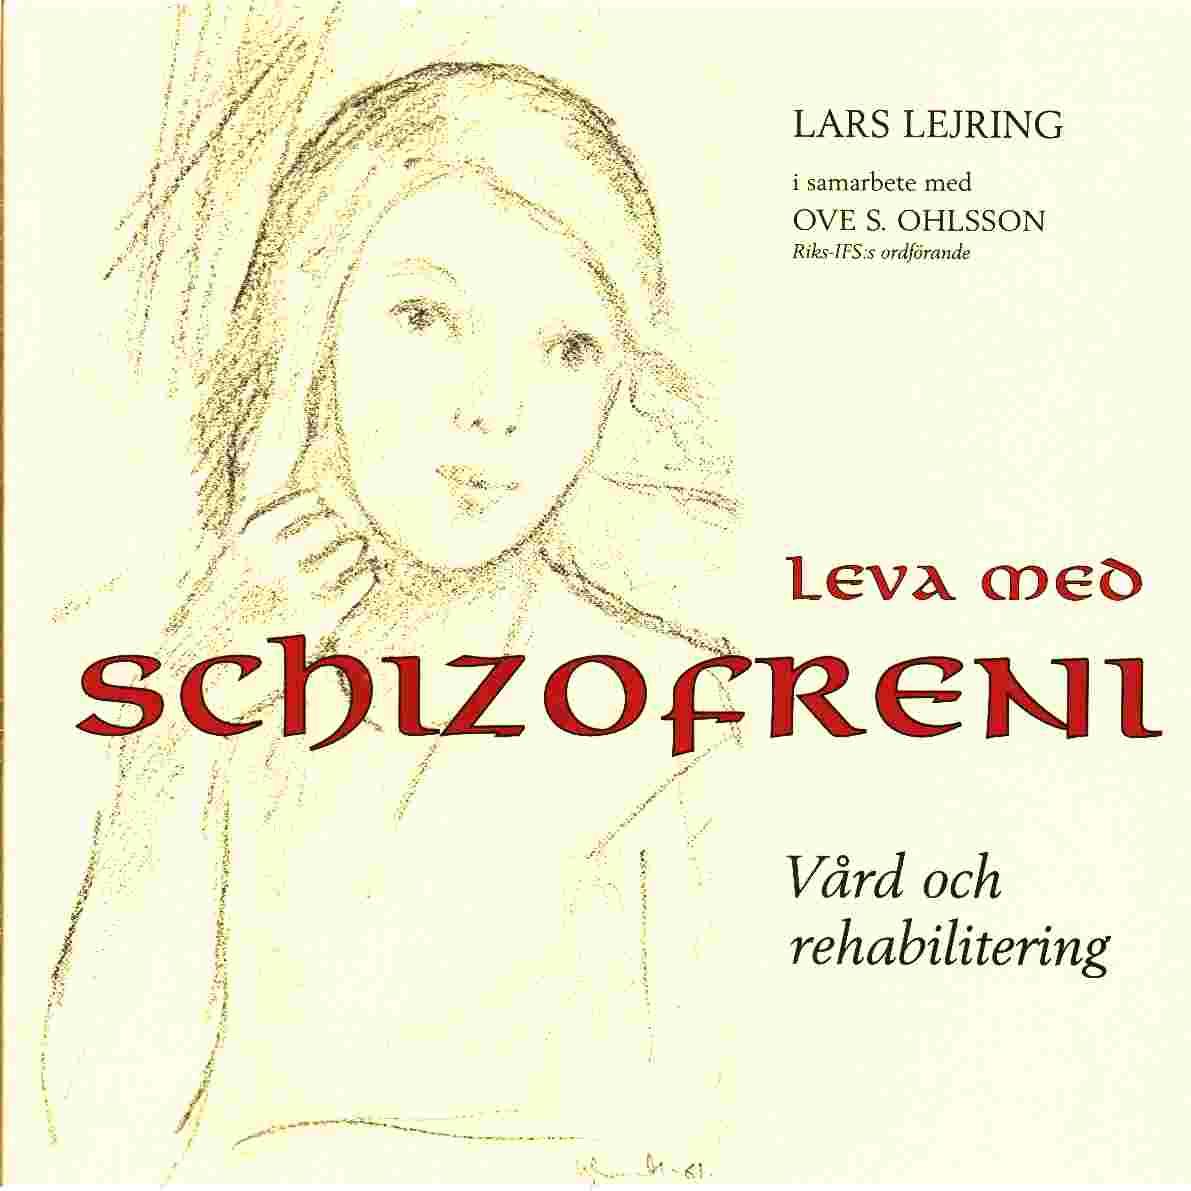 Leva med schizofreni - Lejring, Lars   och  Ohlsson, Ove S.,